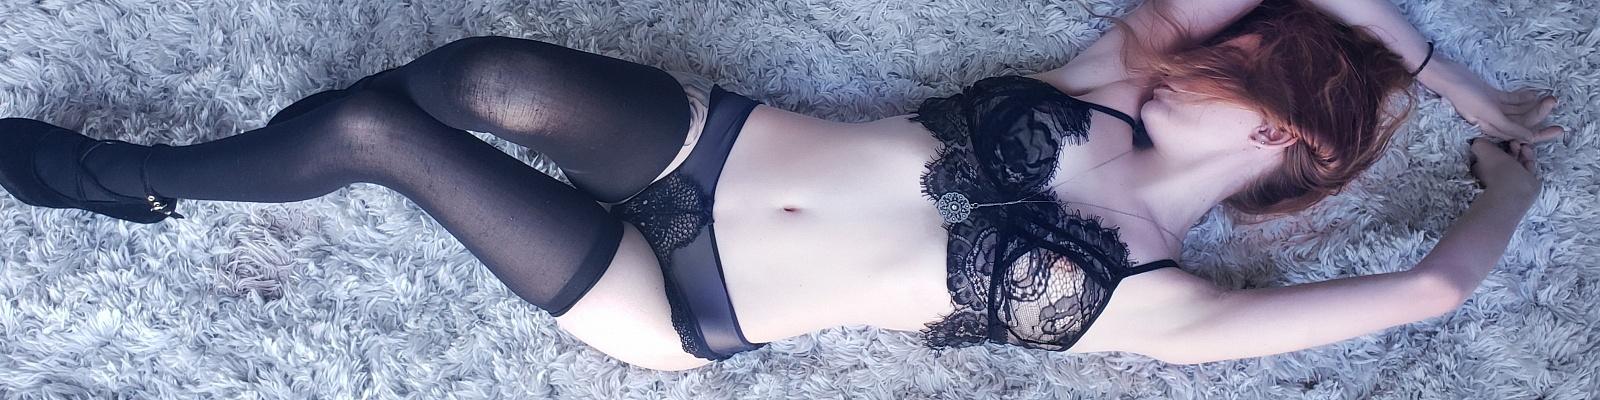 Jessica Heart's Cover Photo